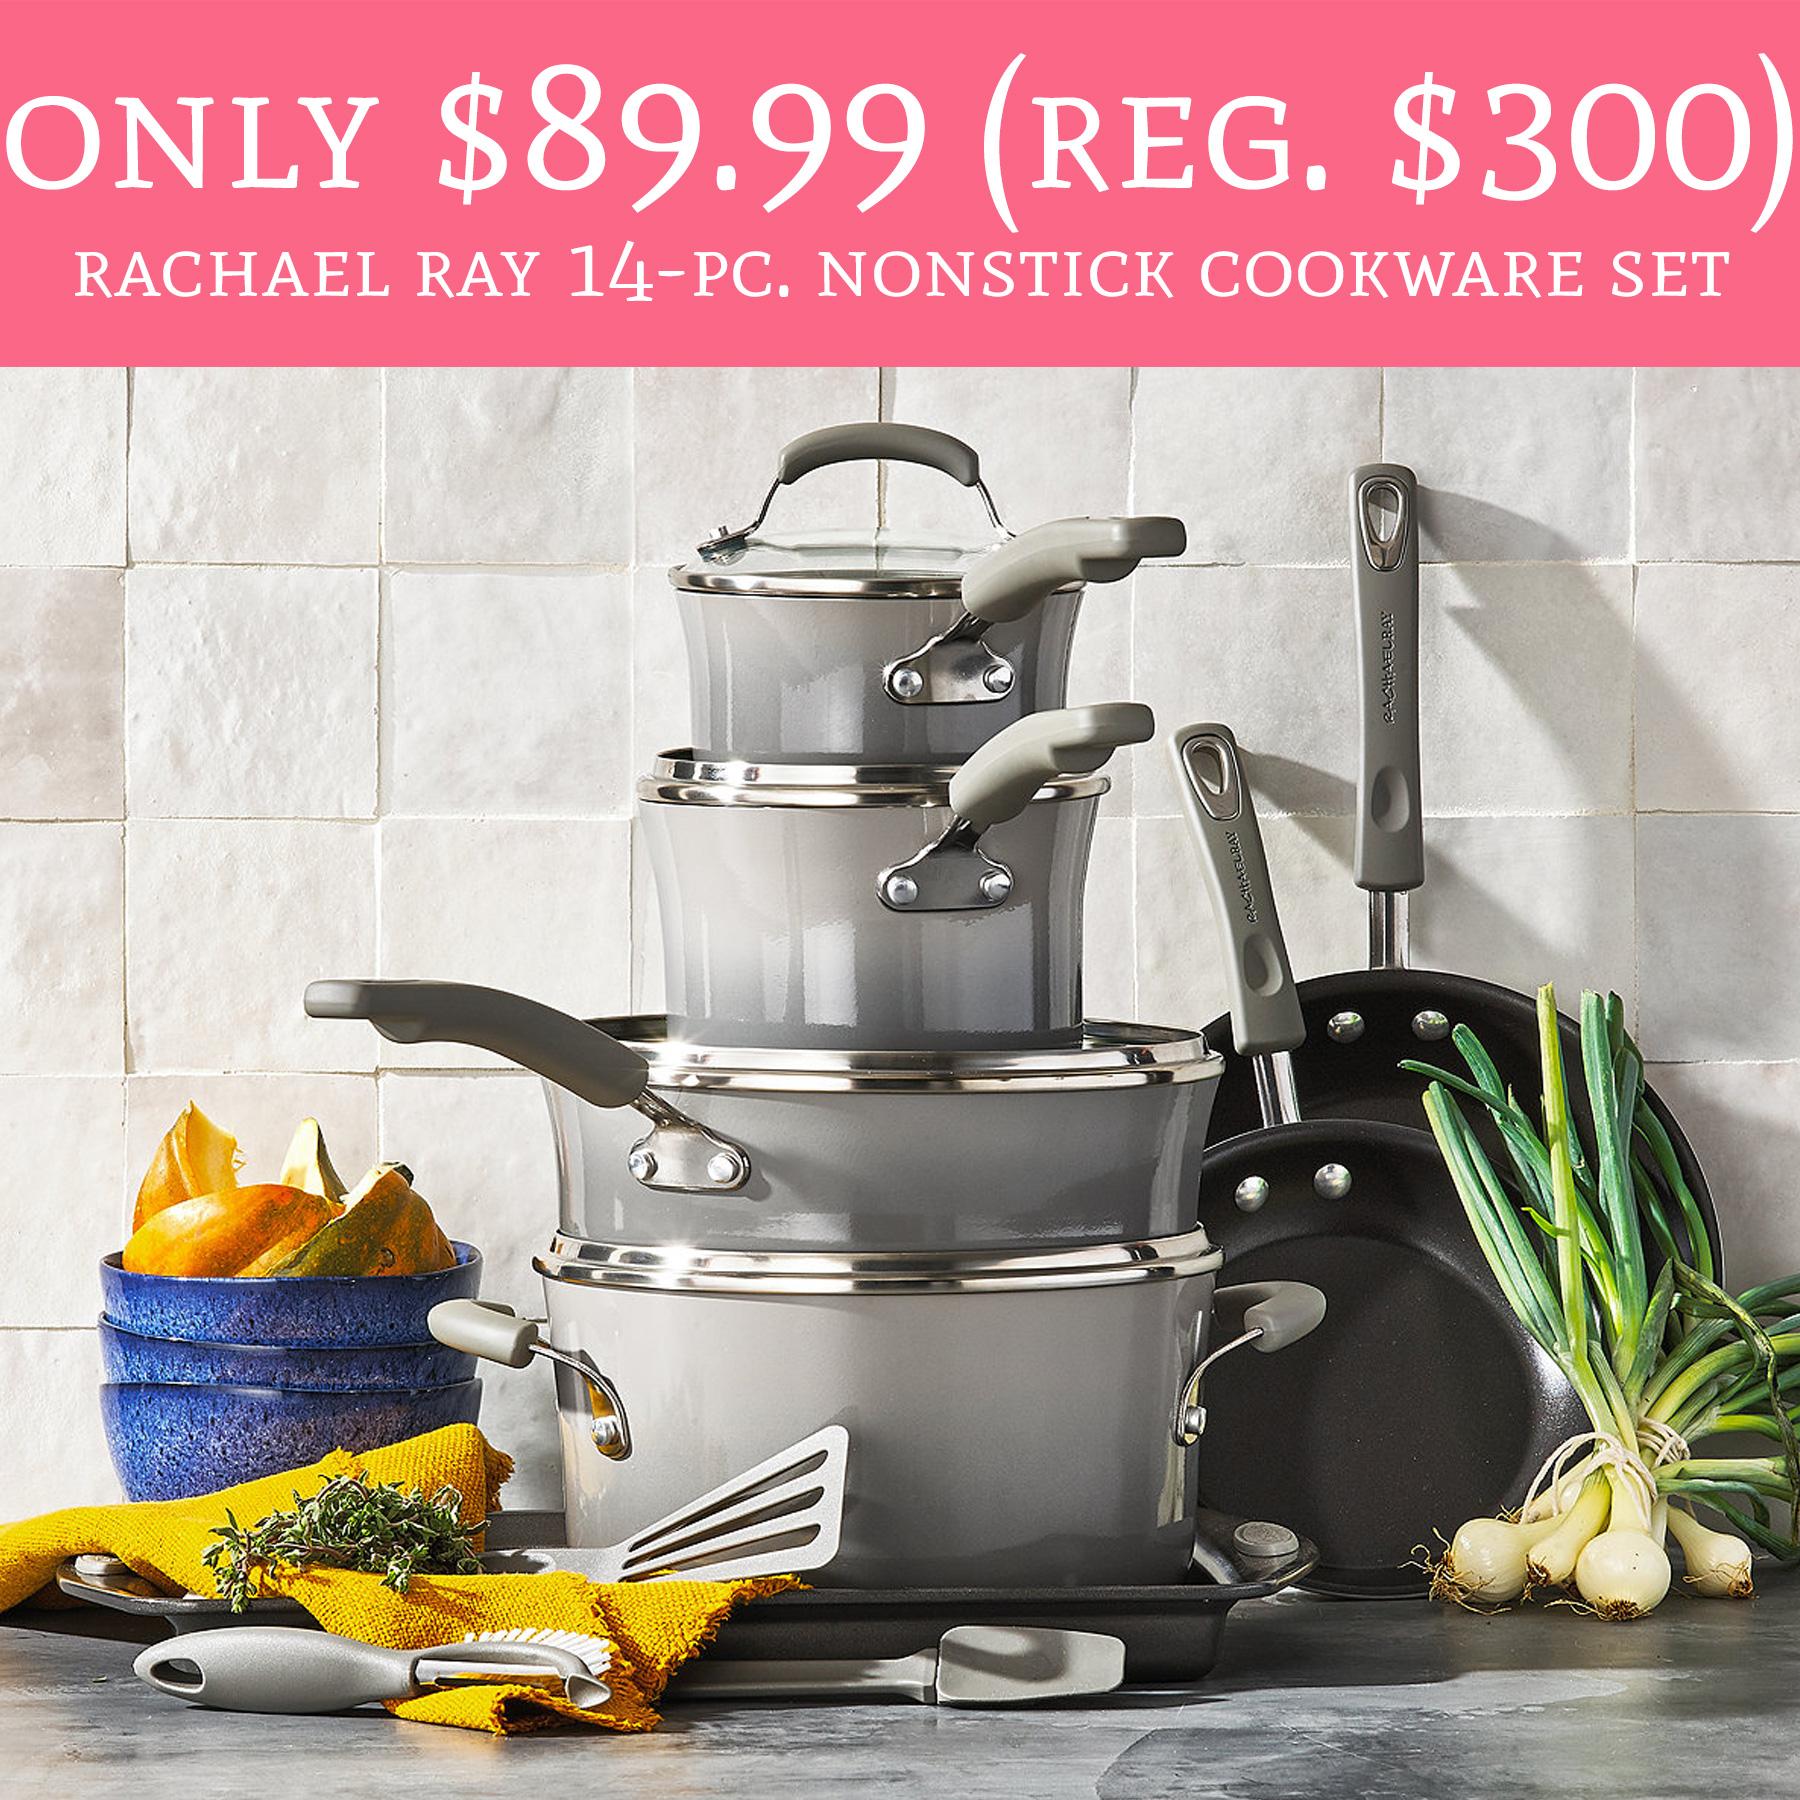 Fullsize Of Rachel Ray Cookware